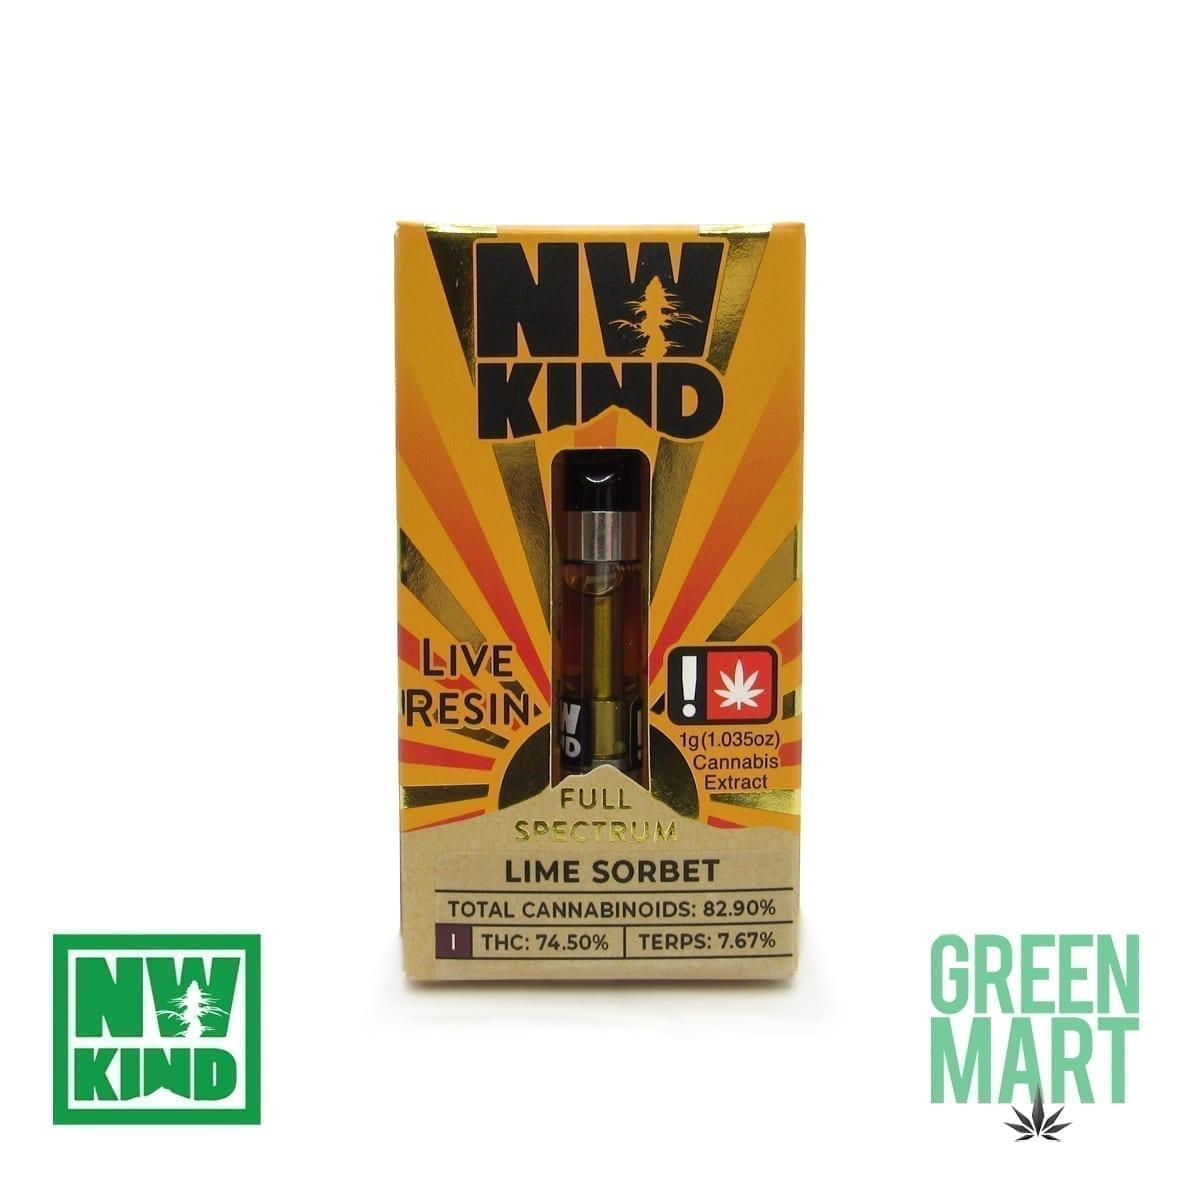 NW Kind Distillate Cartridge - Lime Sorbet